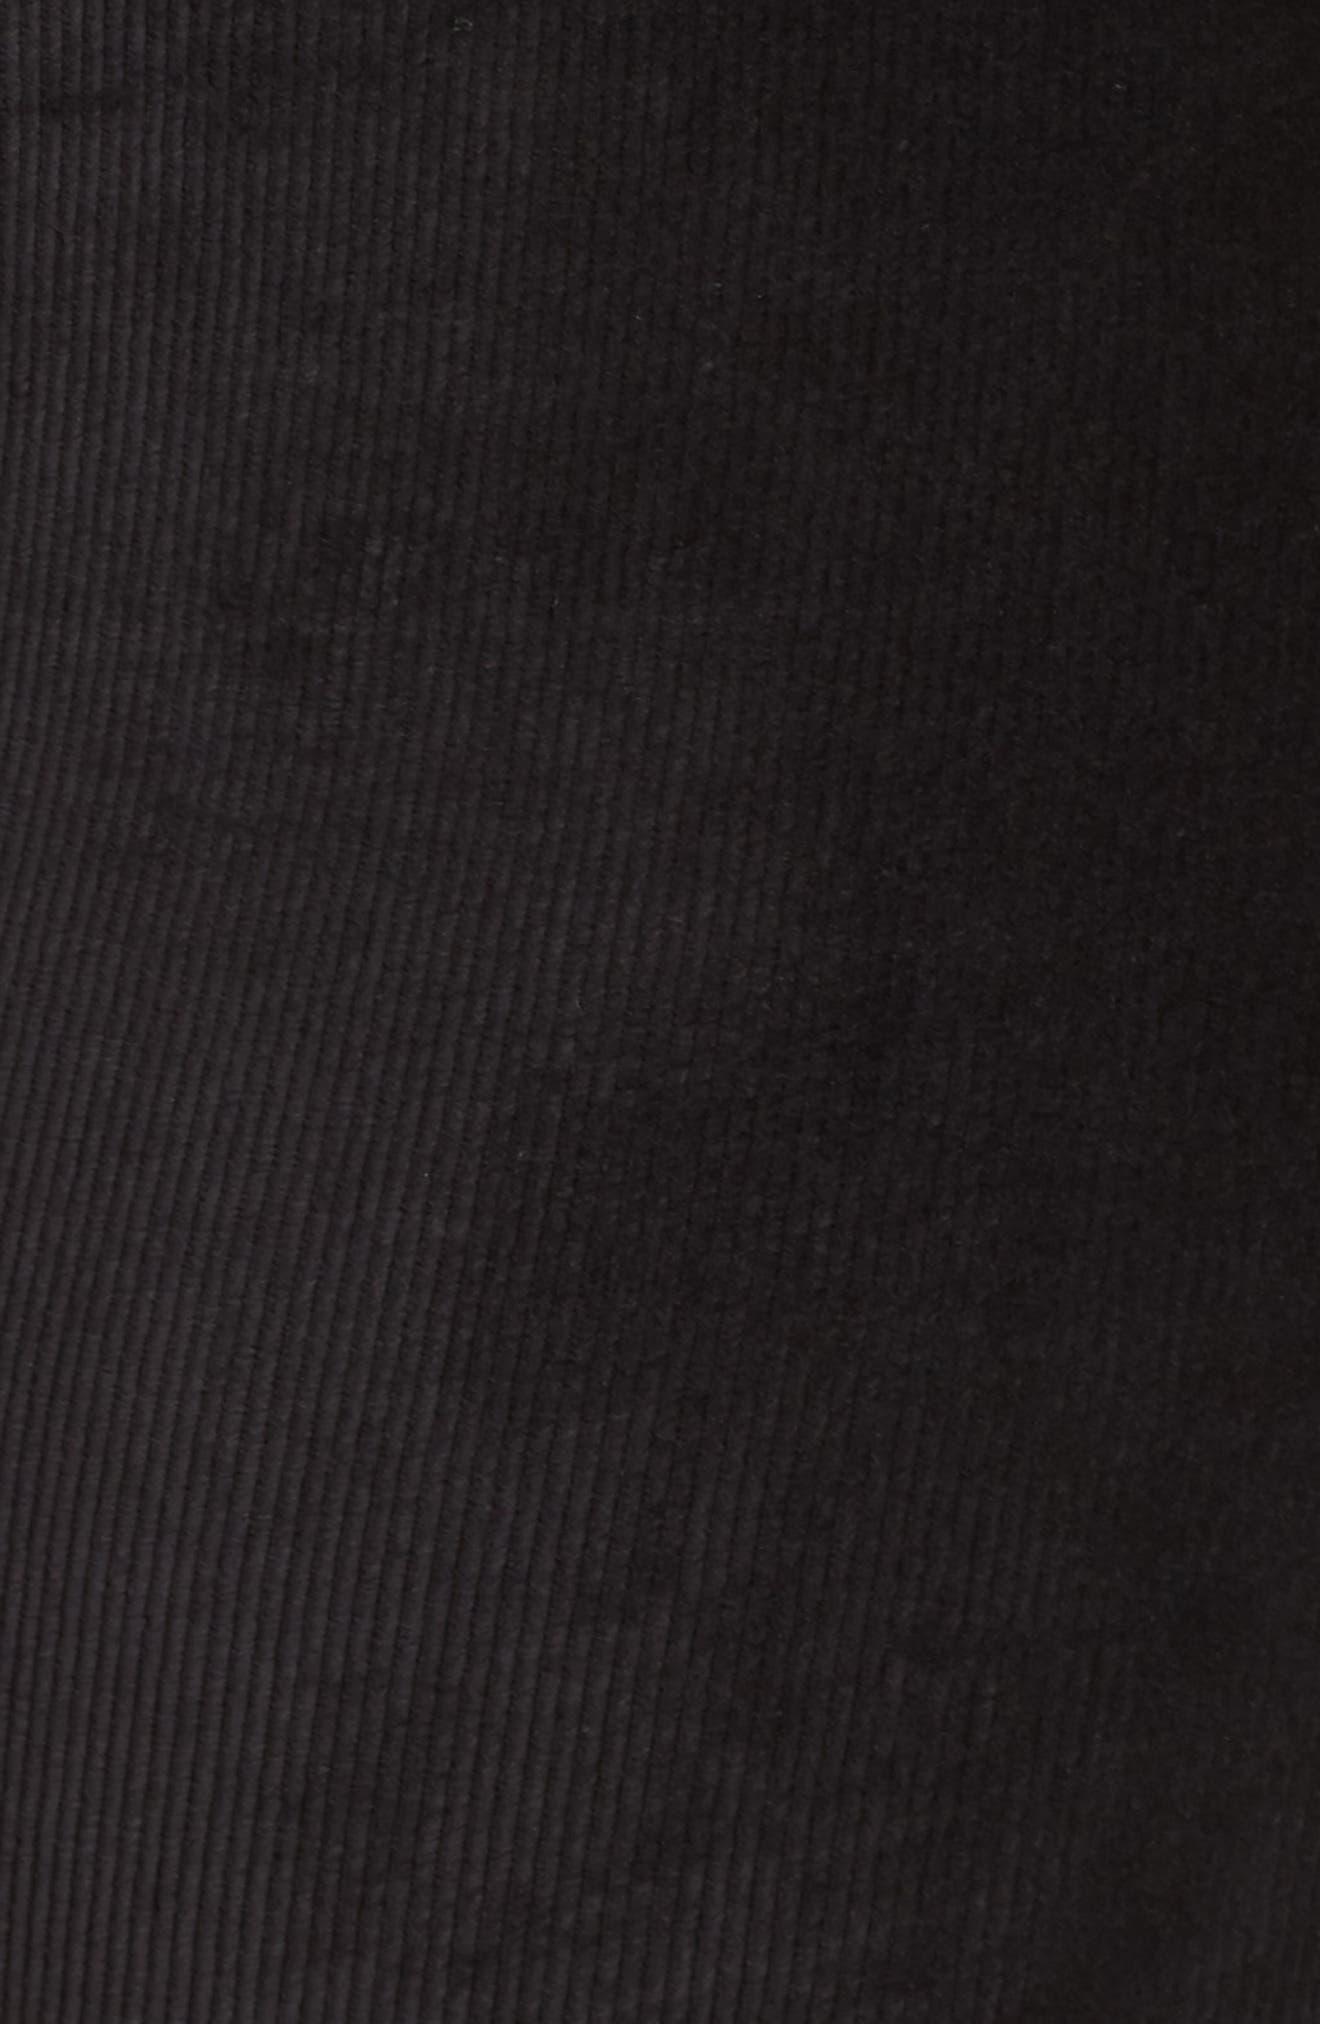 Corduroy Leggings,                             Alternate thumbnail 6, color,                             BLACK